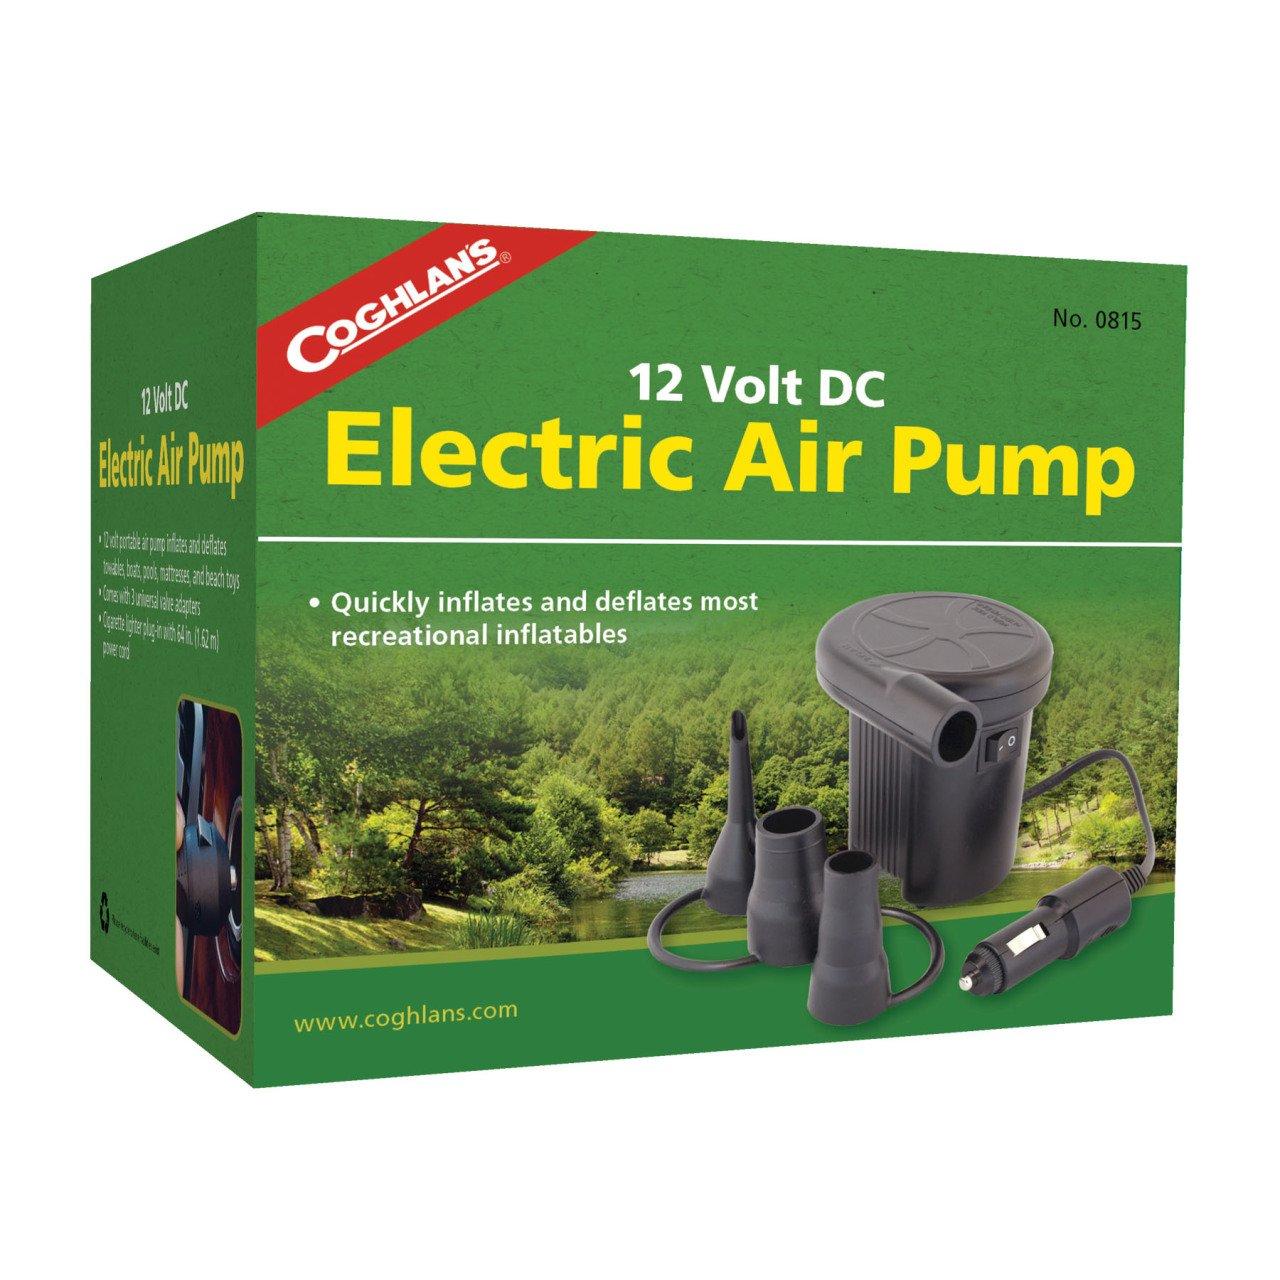 Coghlans Elektrikli Hava Pompası